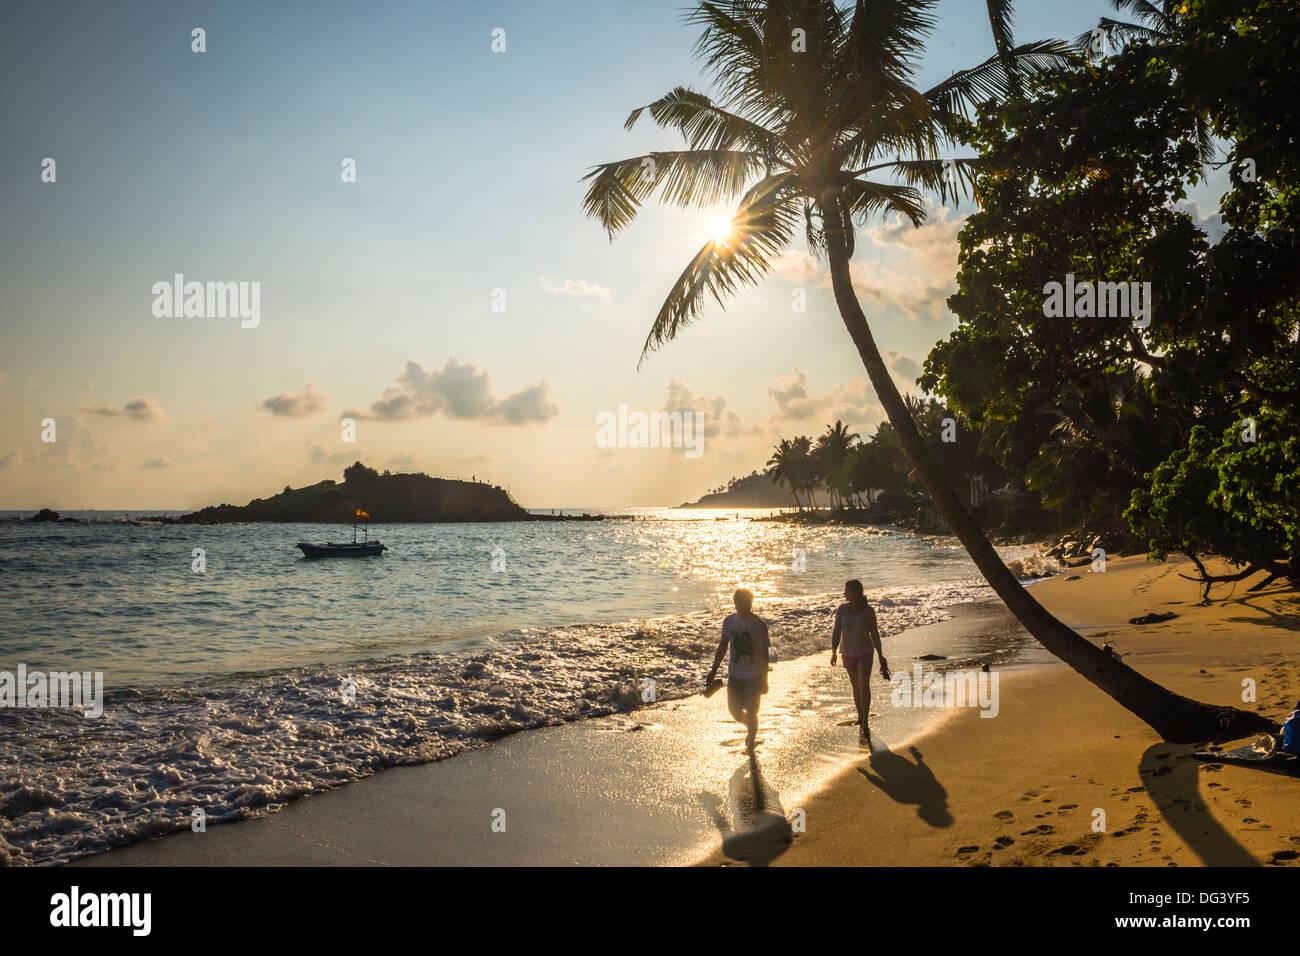 Mirissa Beach, paar, einen romantischen Spaziergang unter Palmen bei Sonnenuntergang, South Coast, Sri Lanka, Asien Stockbild